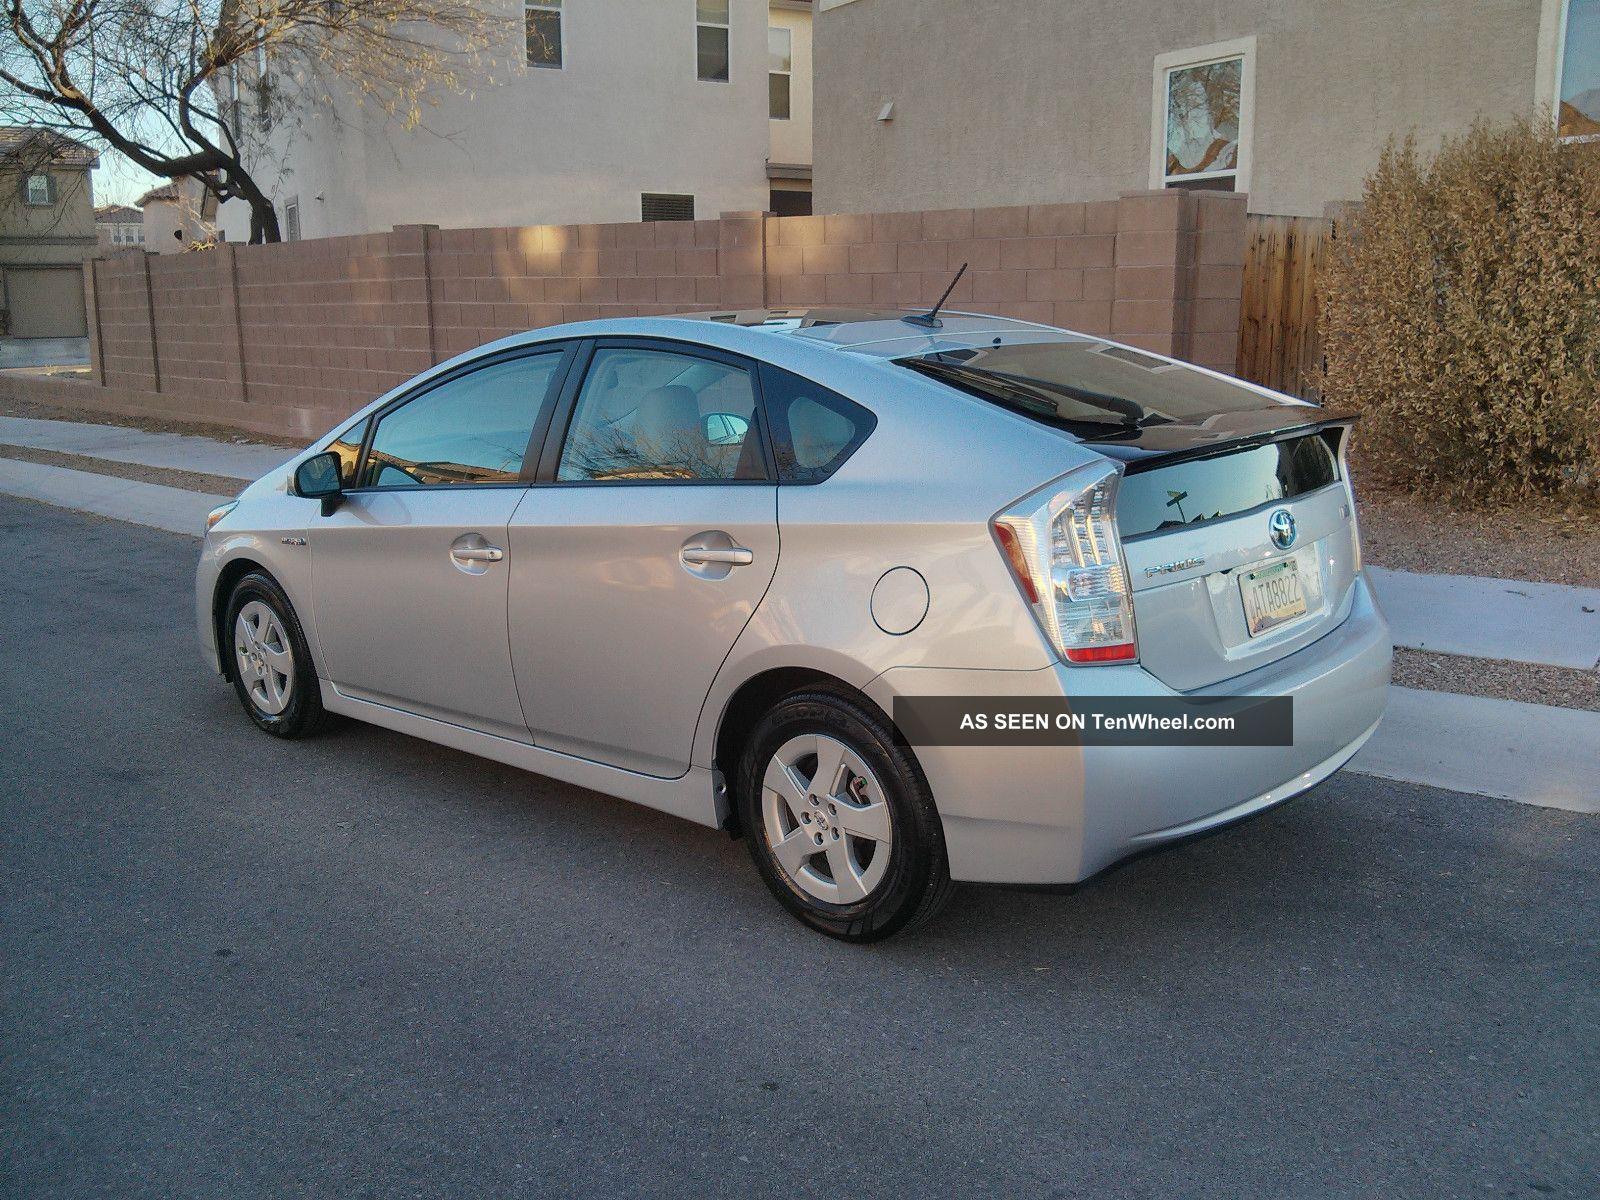 2010 Prius, Gps, , Backup Cam, Smart Key, Jbl Sound, , Solar